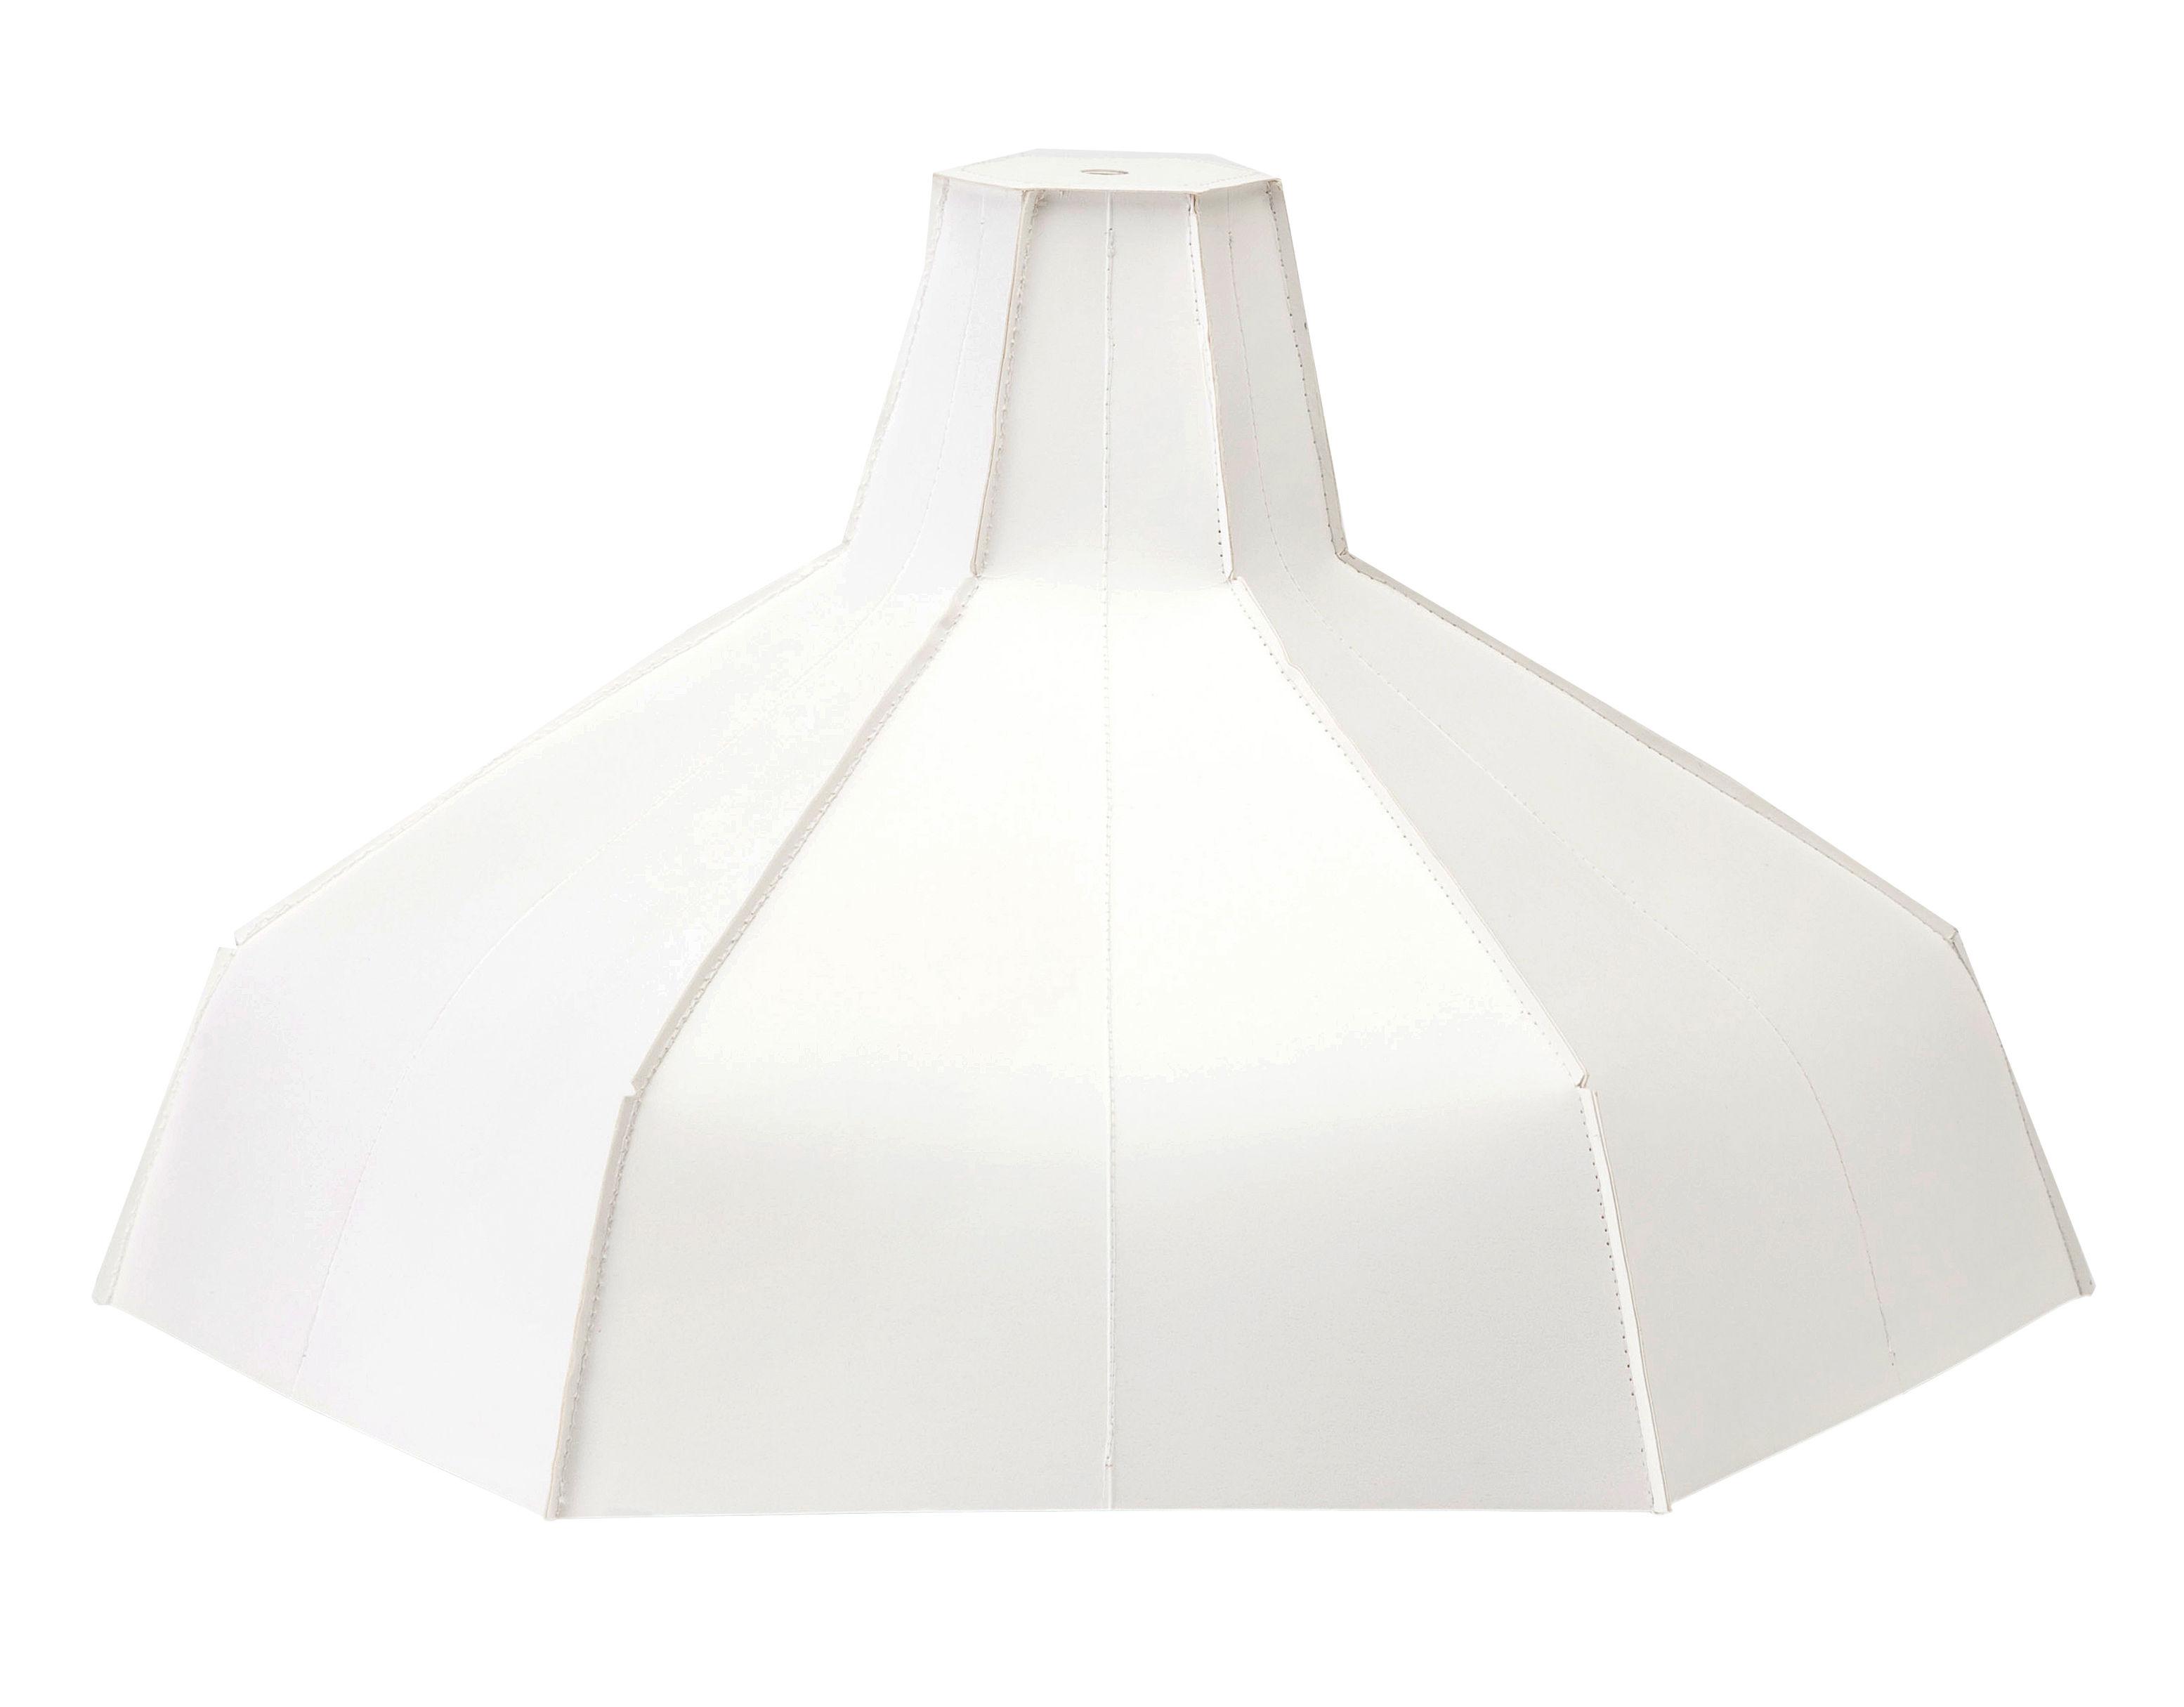 abat jour pepe heykoop papier c ble et ampoule non fournis blanc pop corn made in design. Black Bedroom Furniture Sets. Home Design Ideas